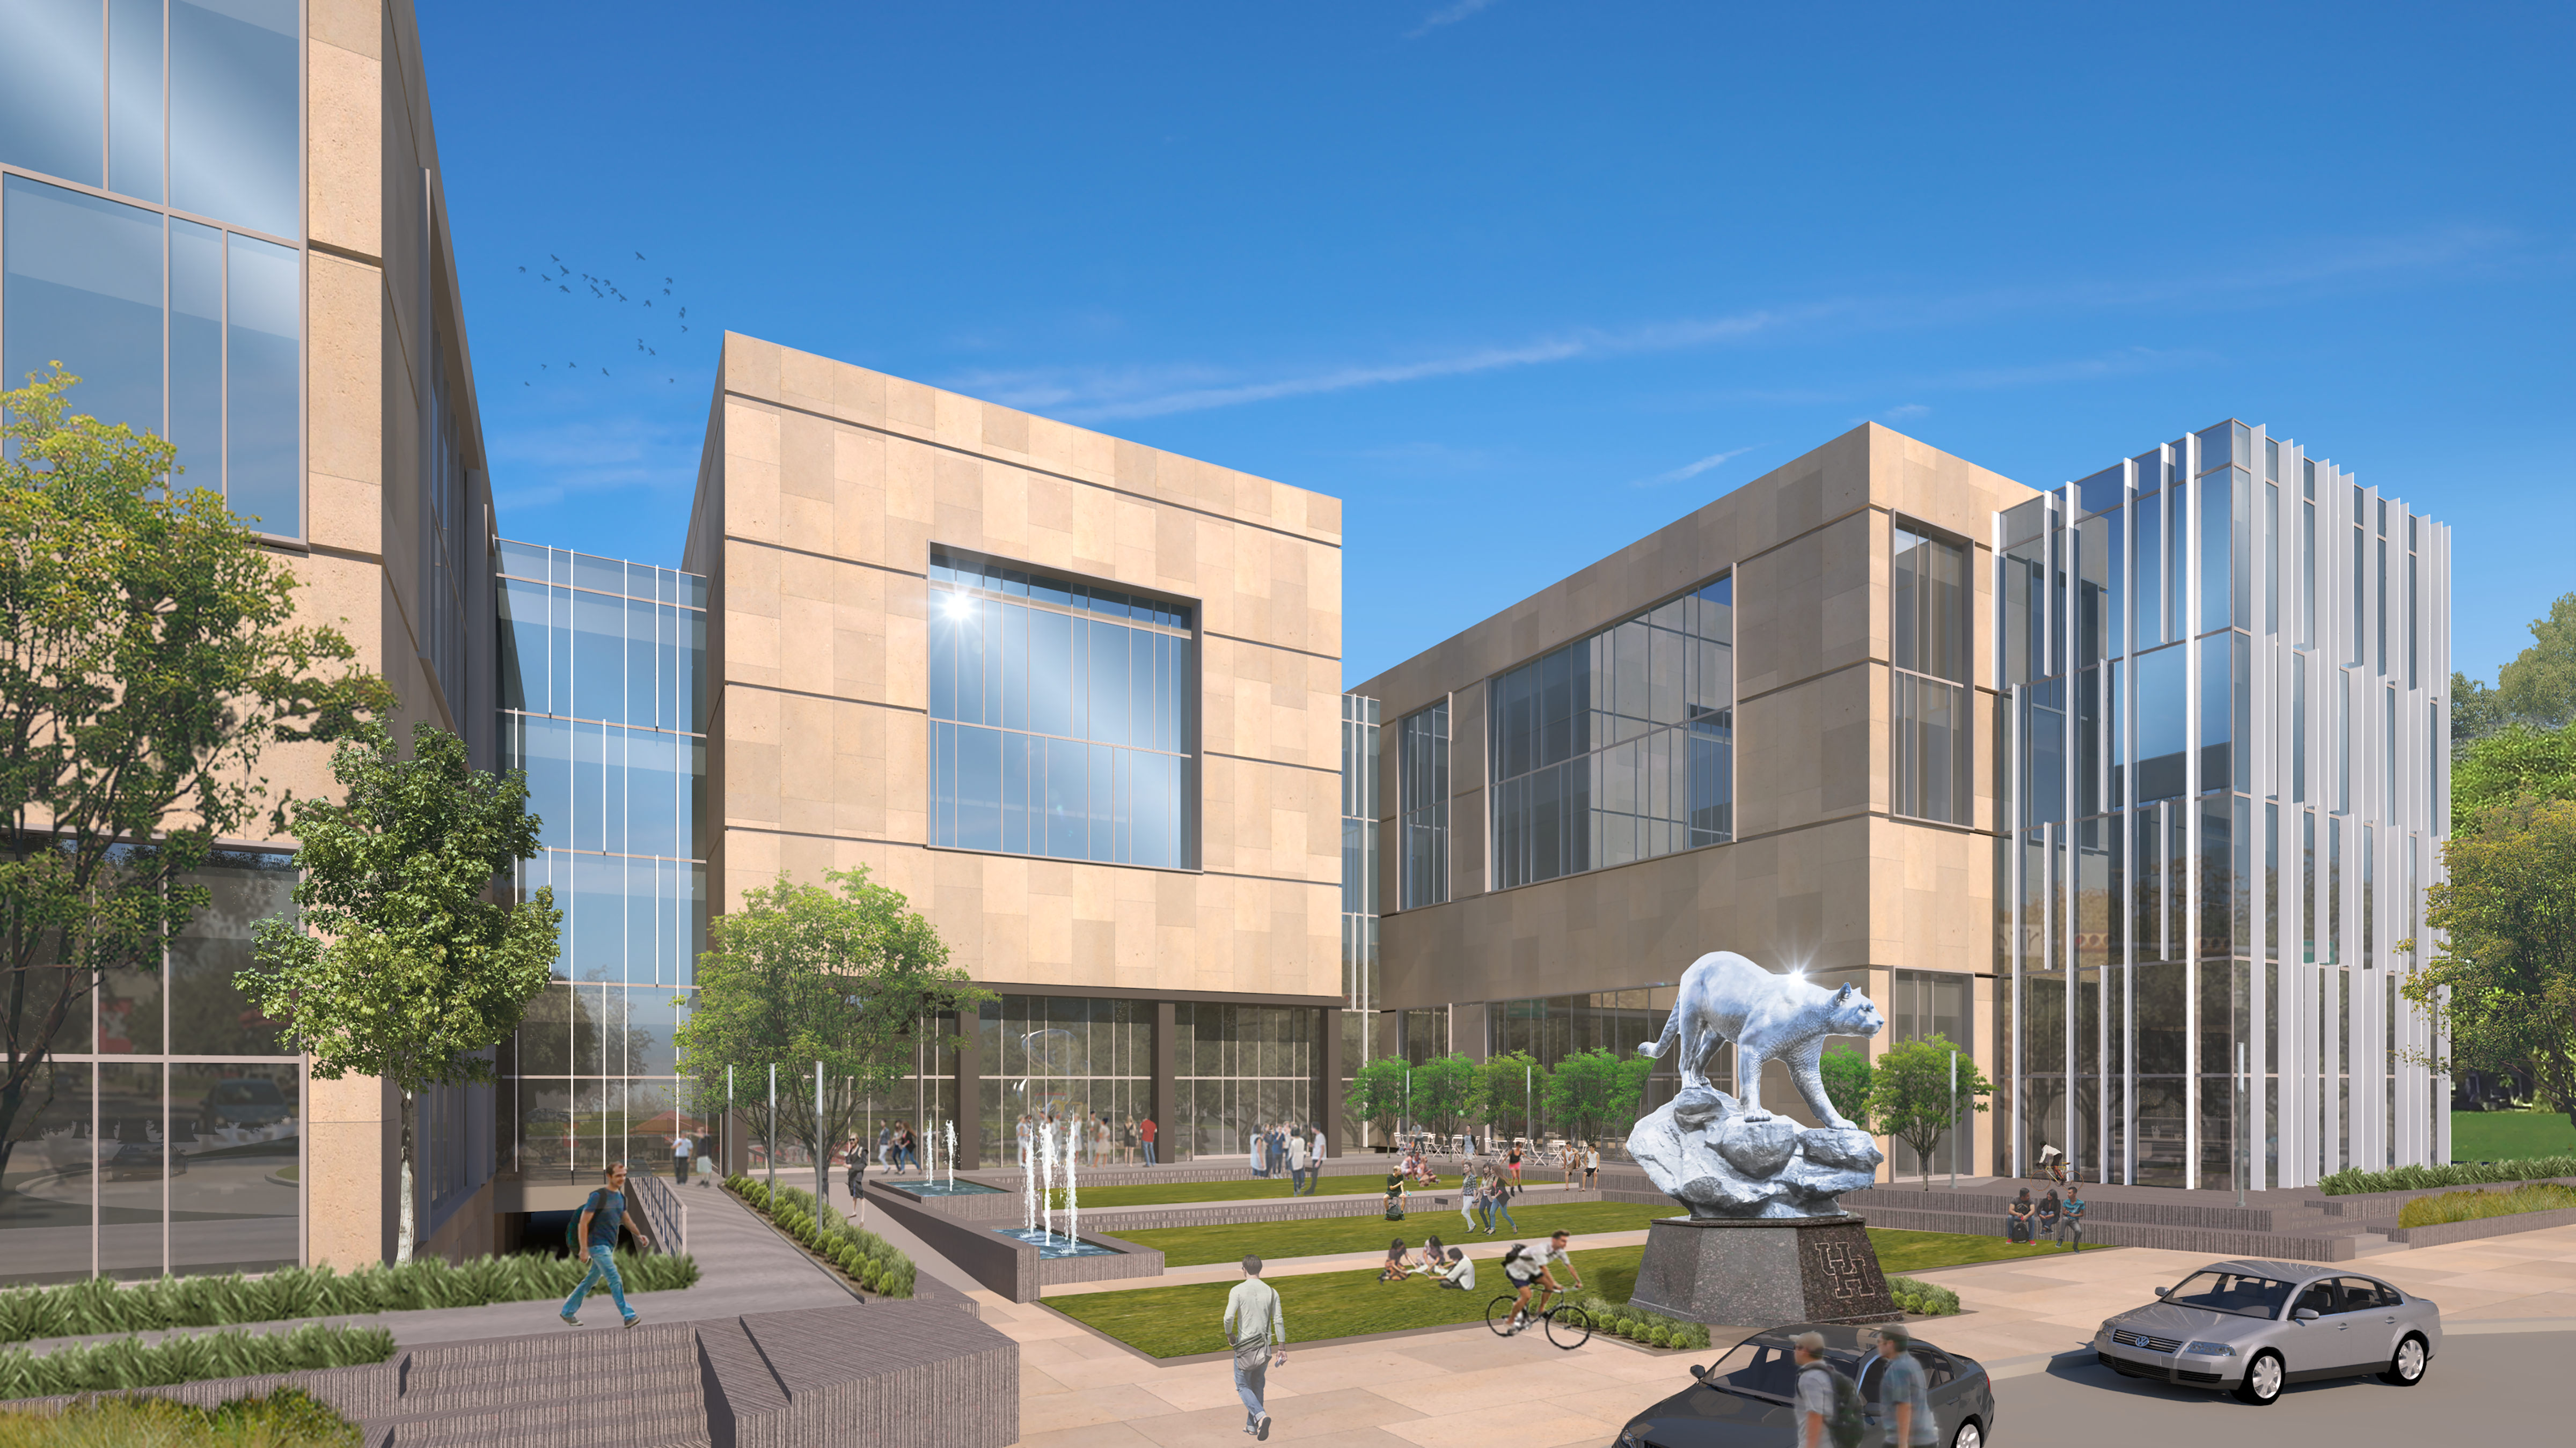 UH board of regents approves medical school